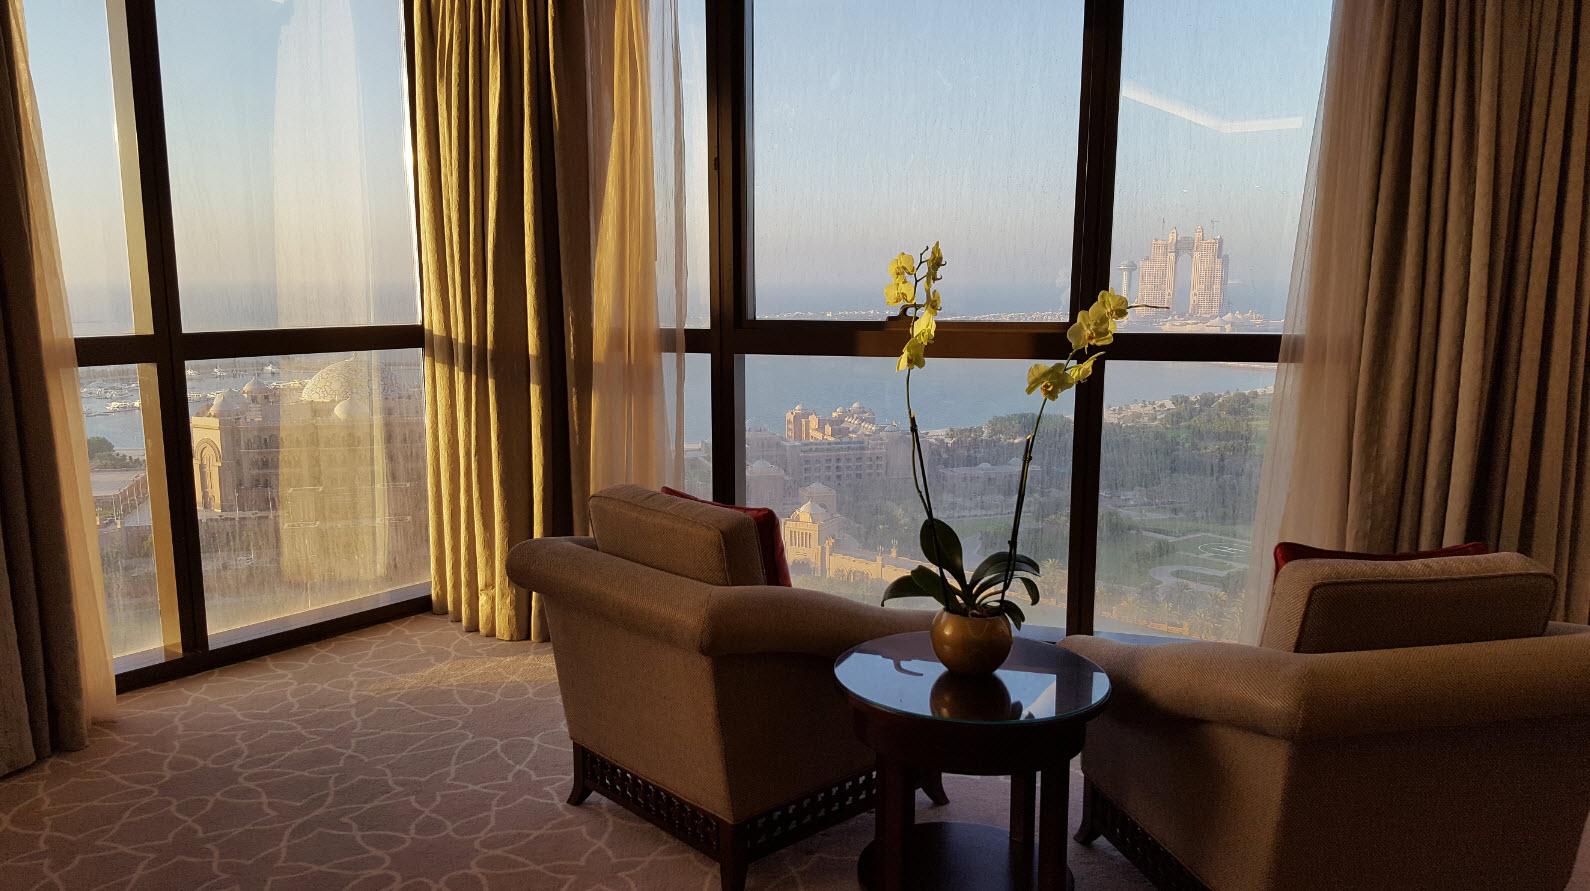 Vue sur les Palais Abu Dhabi